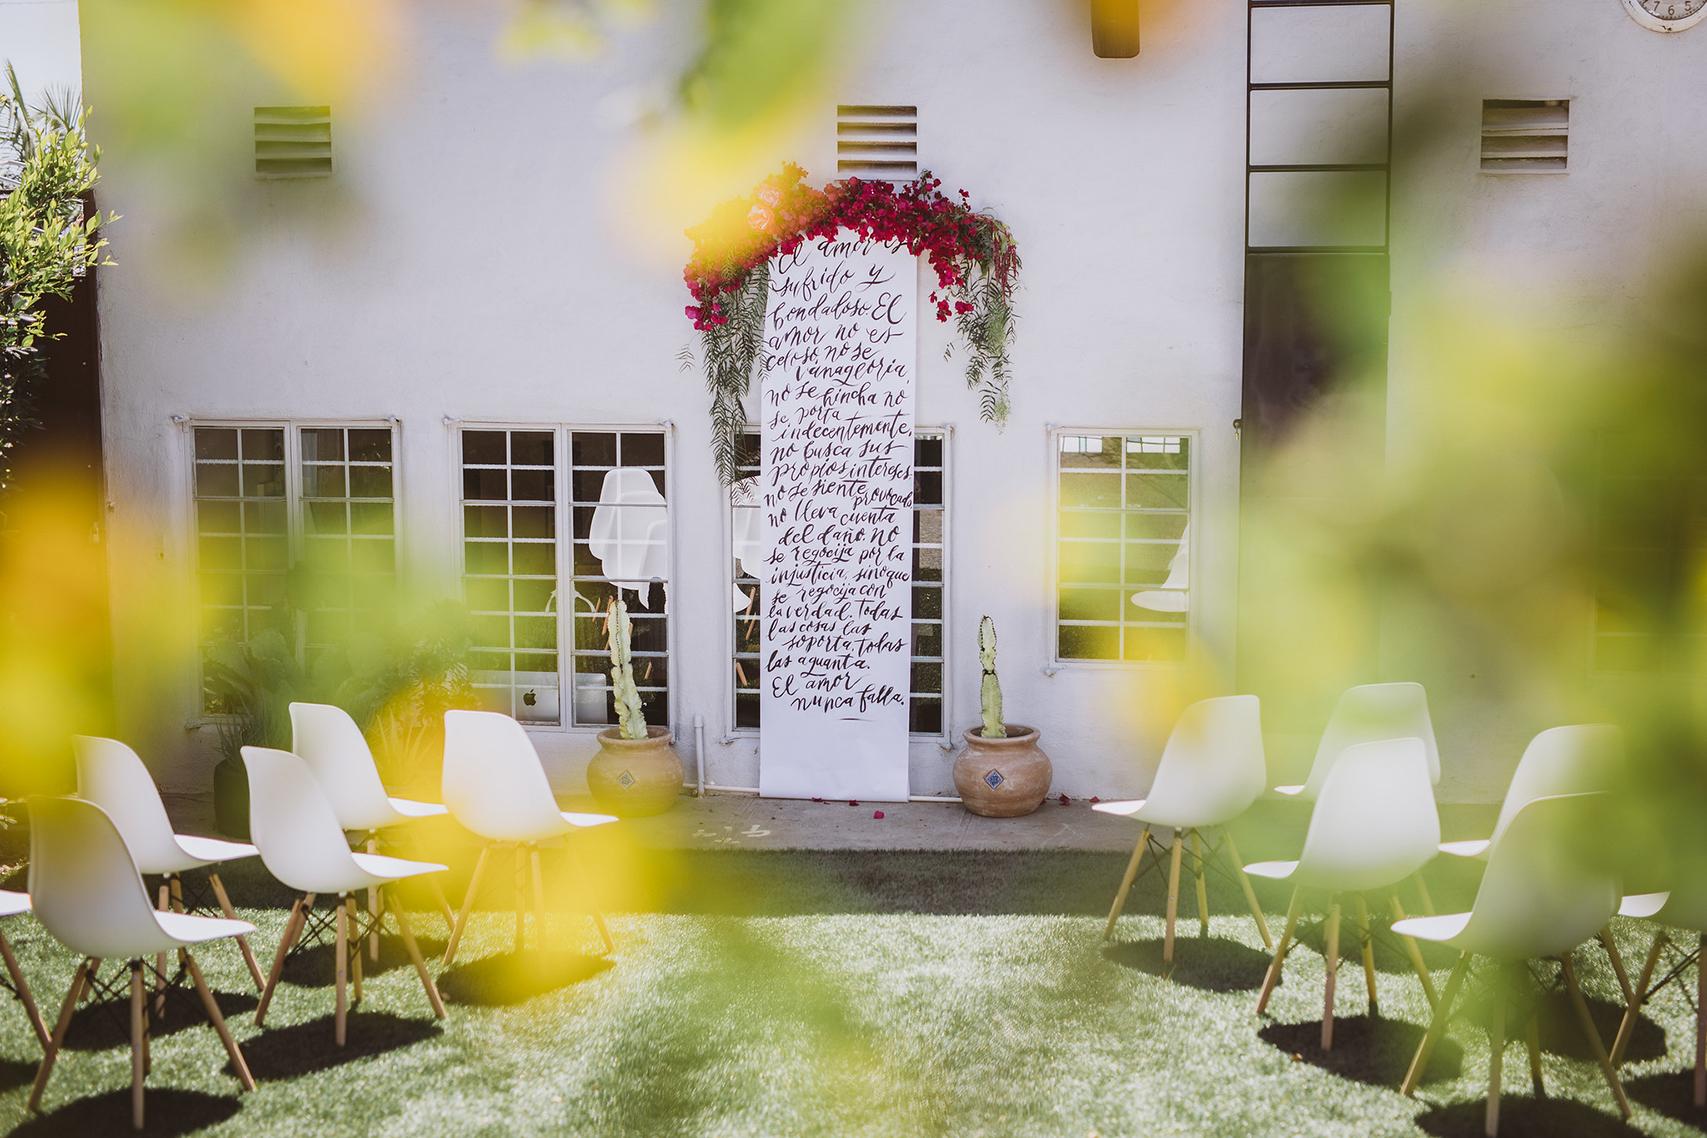 wedding_ceremonybackdrop_barriologanphotoshoot_ceremonyquote.JPG